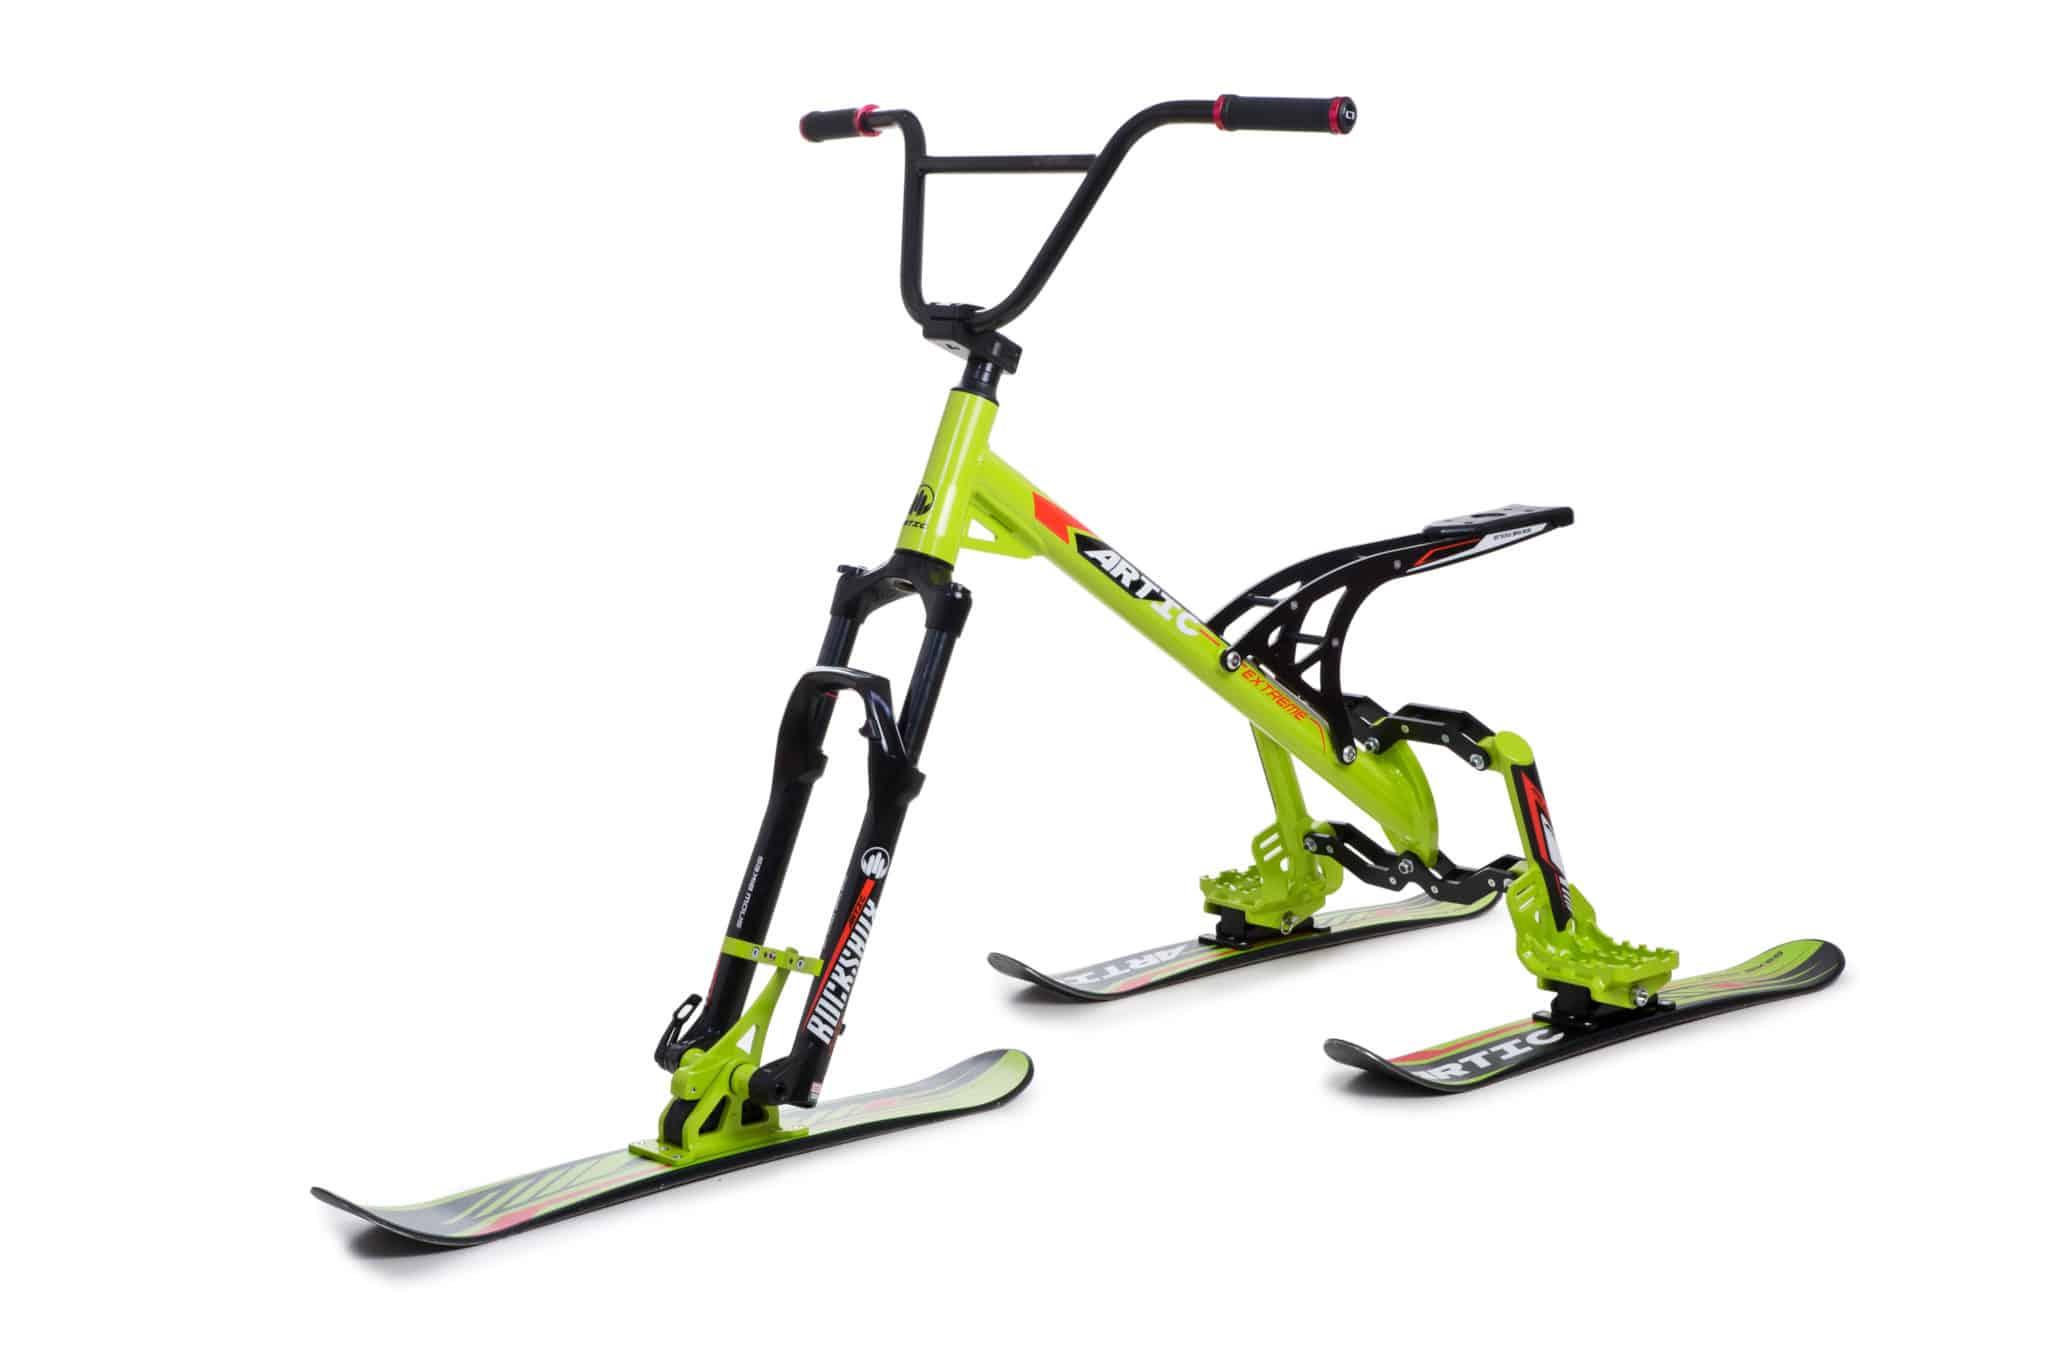 Artic-snowbike-rental-esports-santmoritz-arinsal-vallnord-pal (15)